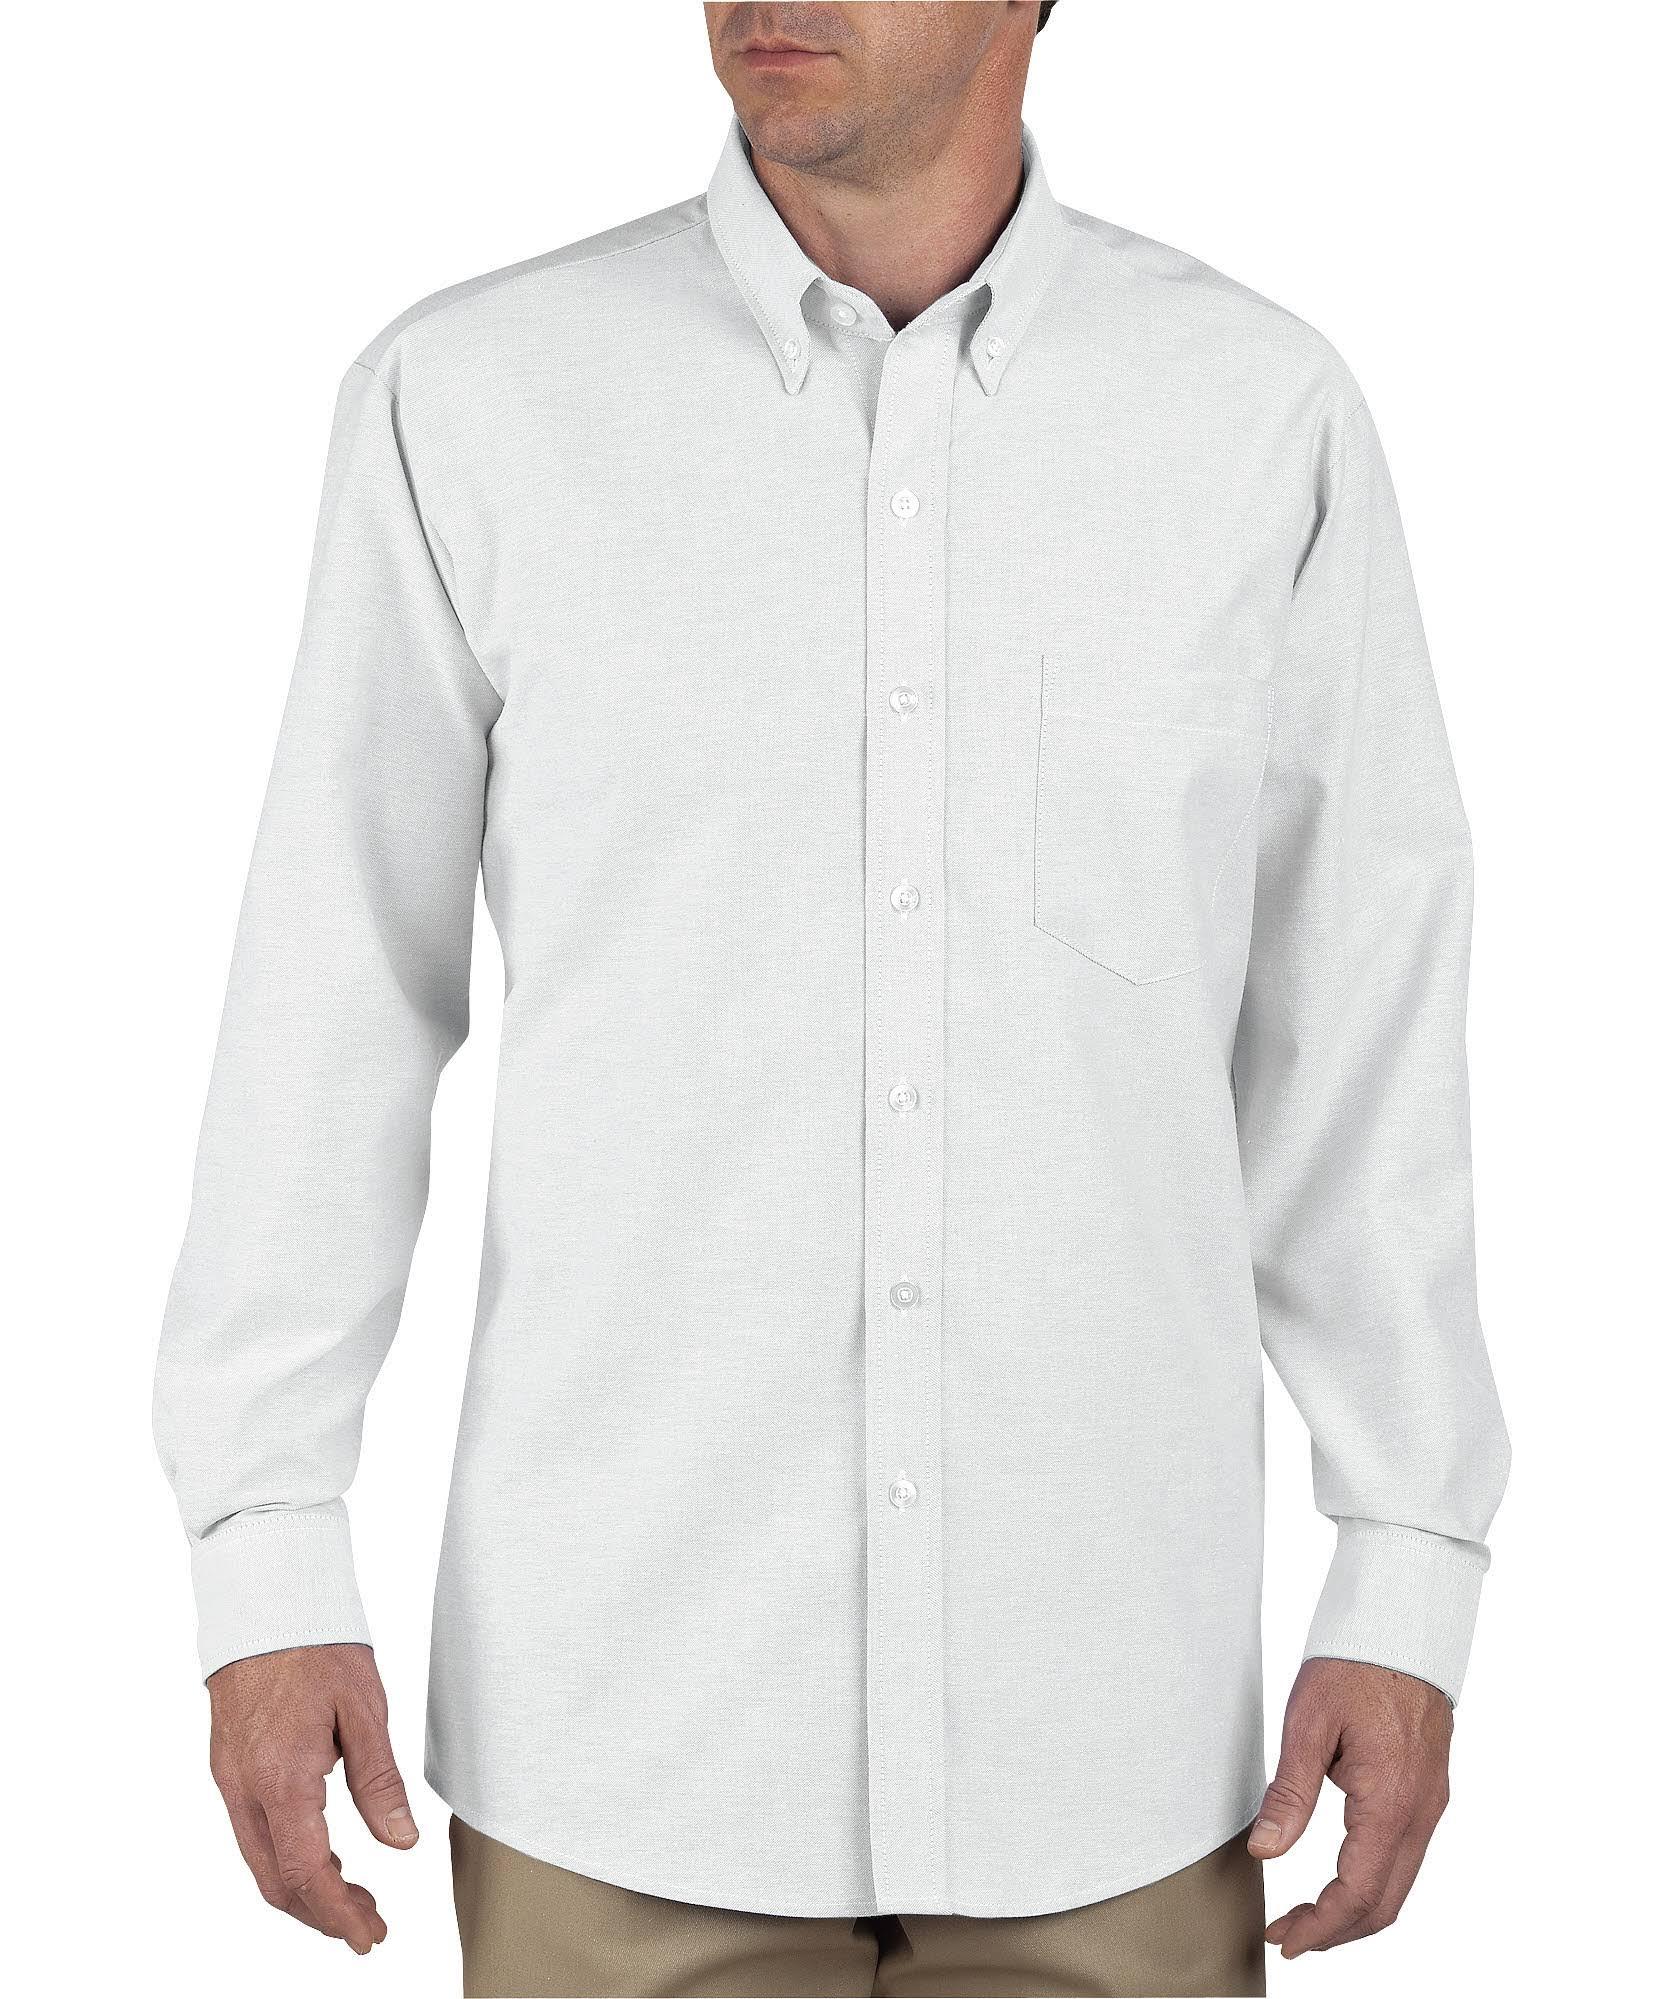 Larga Oxford Camisa Blanco 14 Ss36 Dicks Abotonado Manga 5 De 171gxt